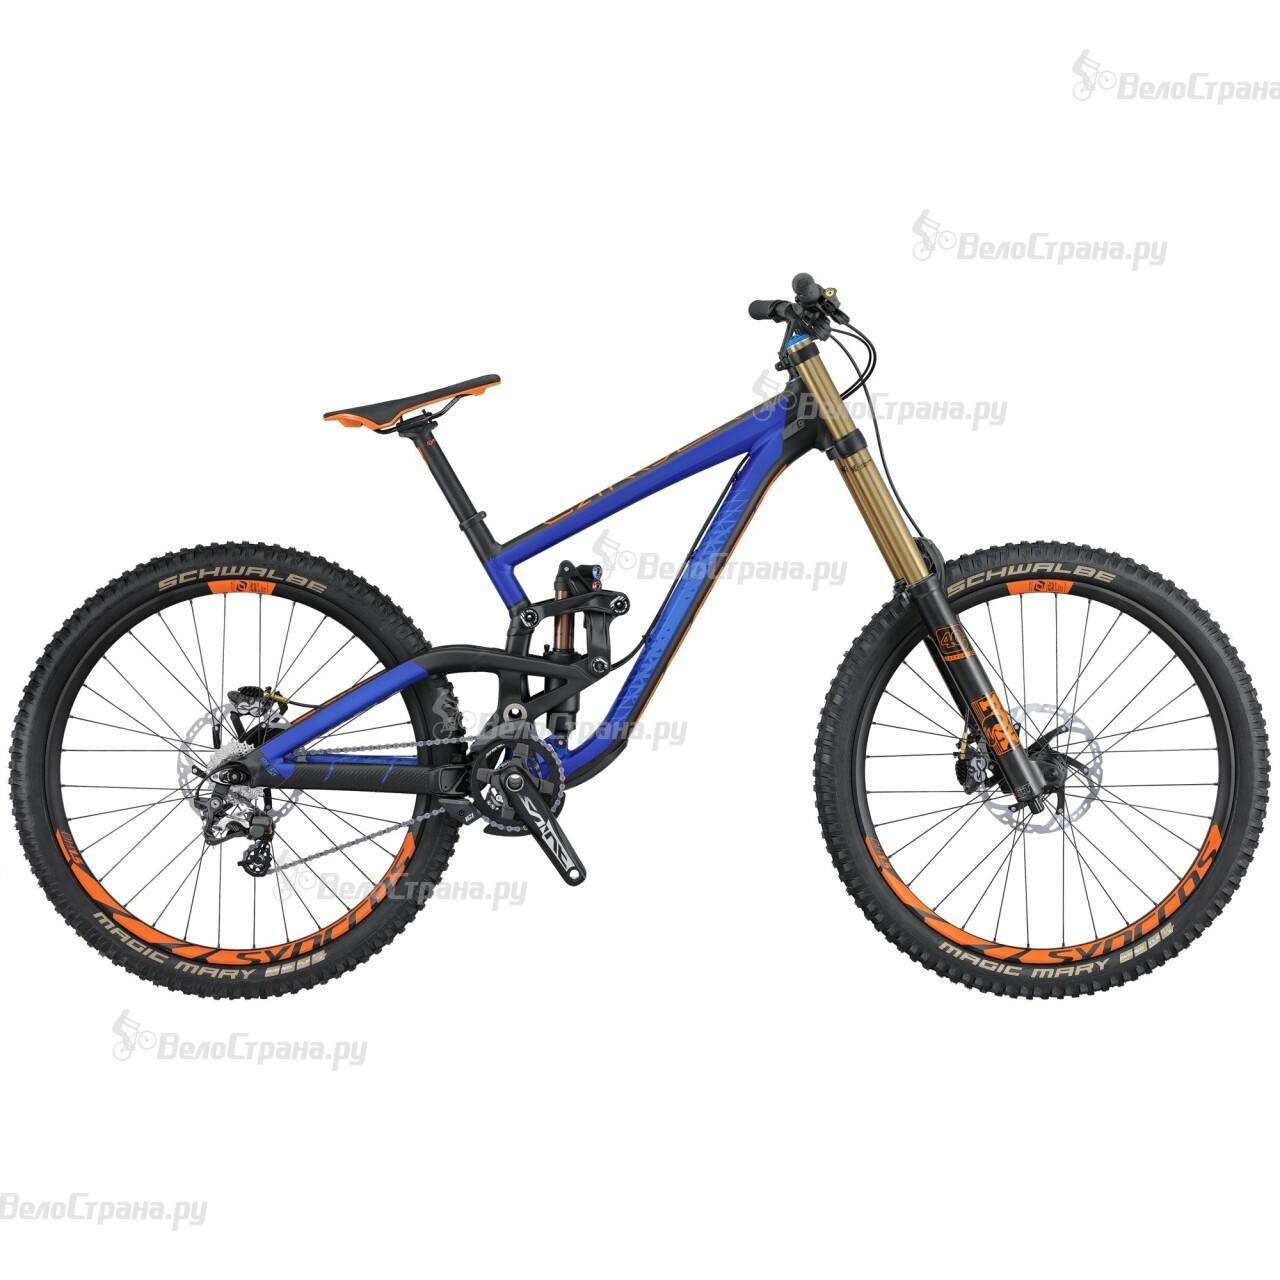 Велосипед Scott GAMBLER 710 (2016) велосипед scott gambler 720 2015